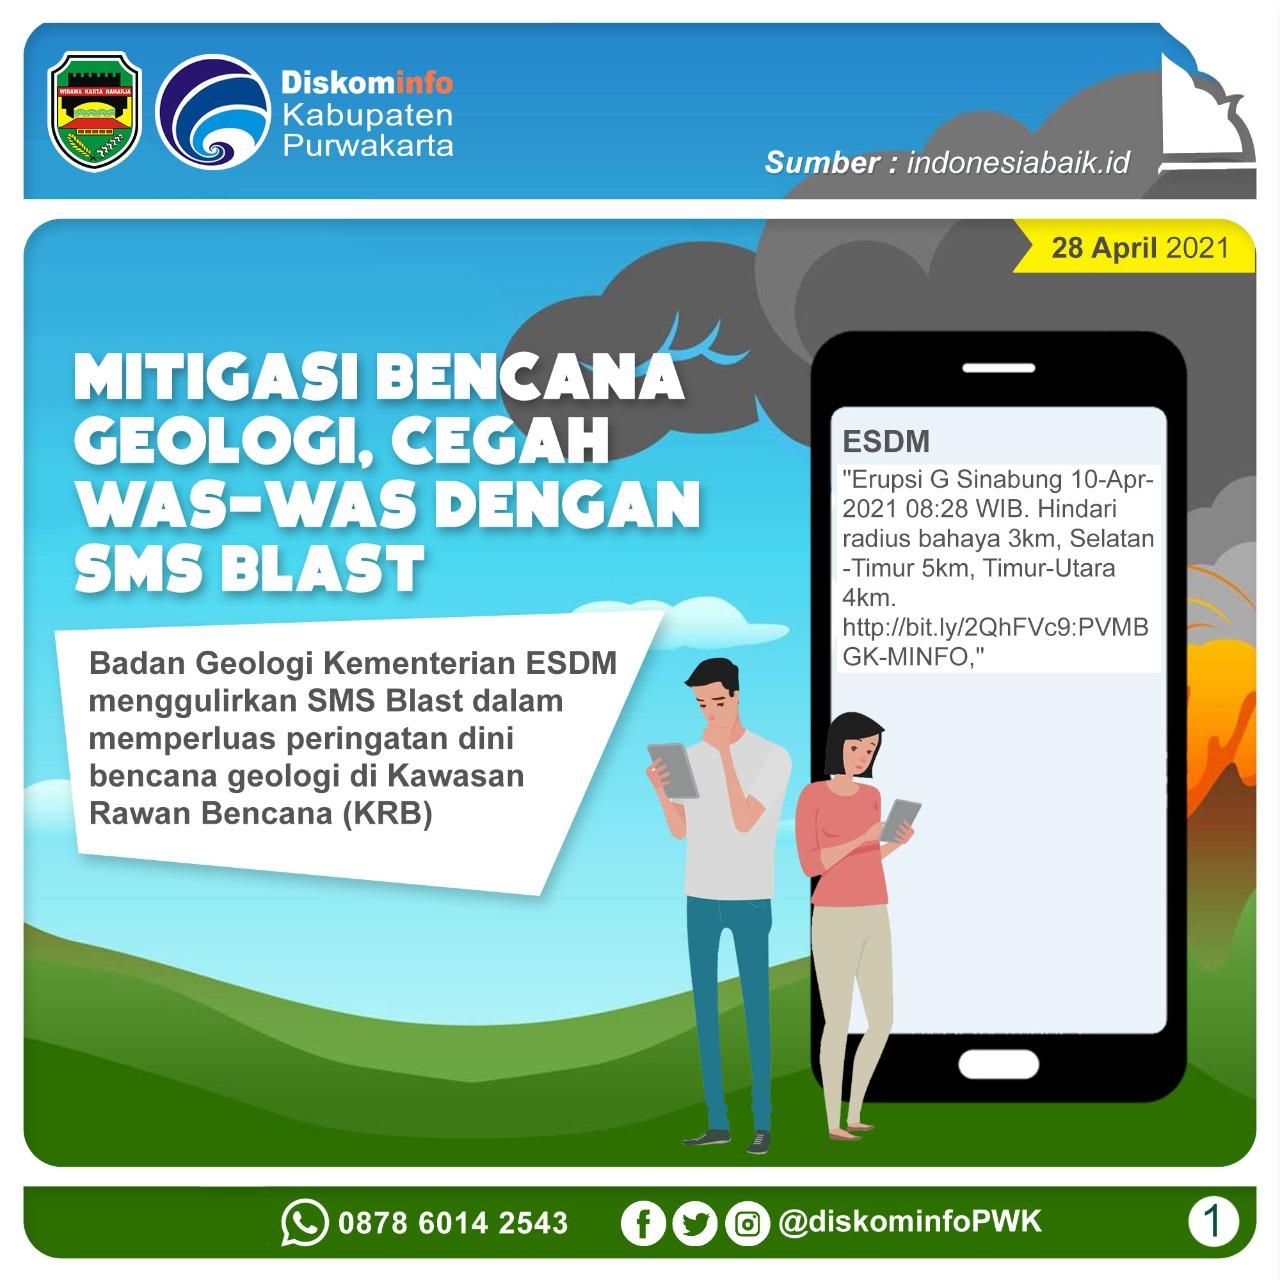 Mitigasi Bencana Geologi, Cegah Was-was dengan SMS Blast